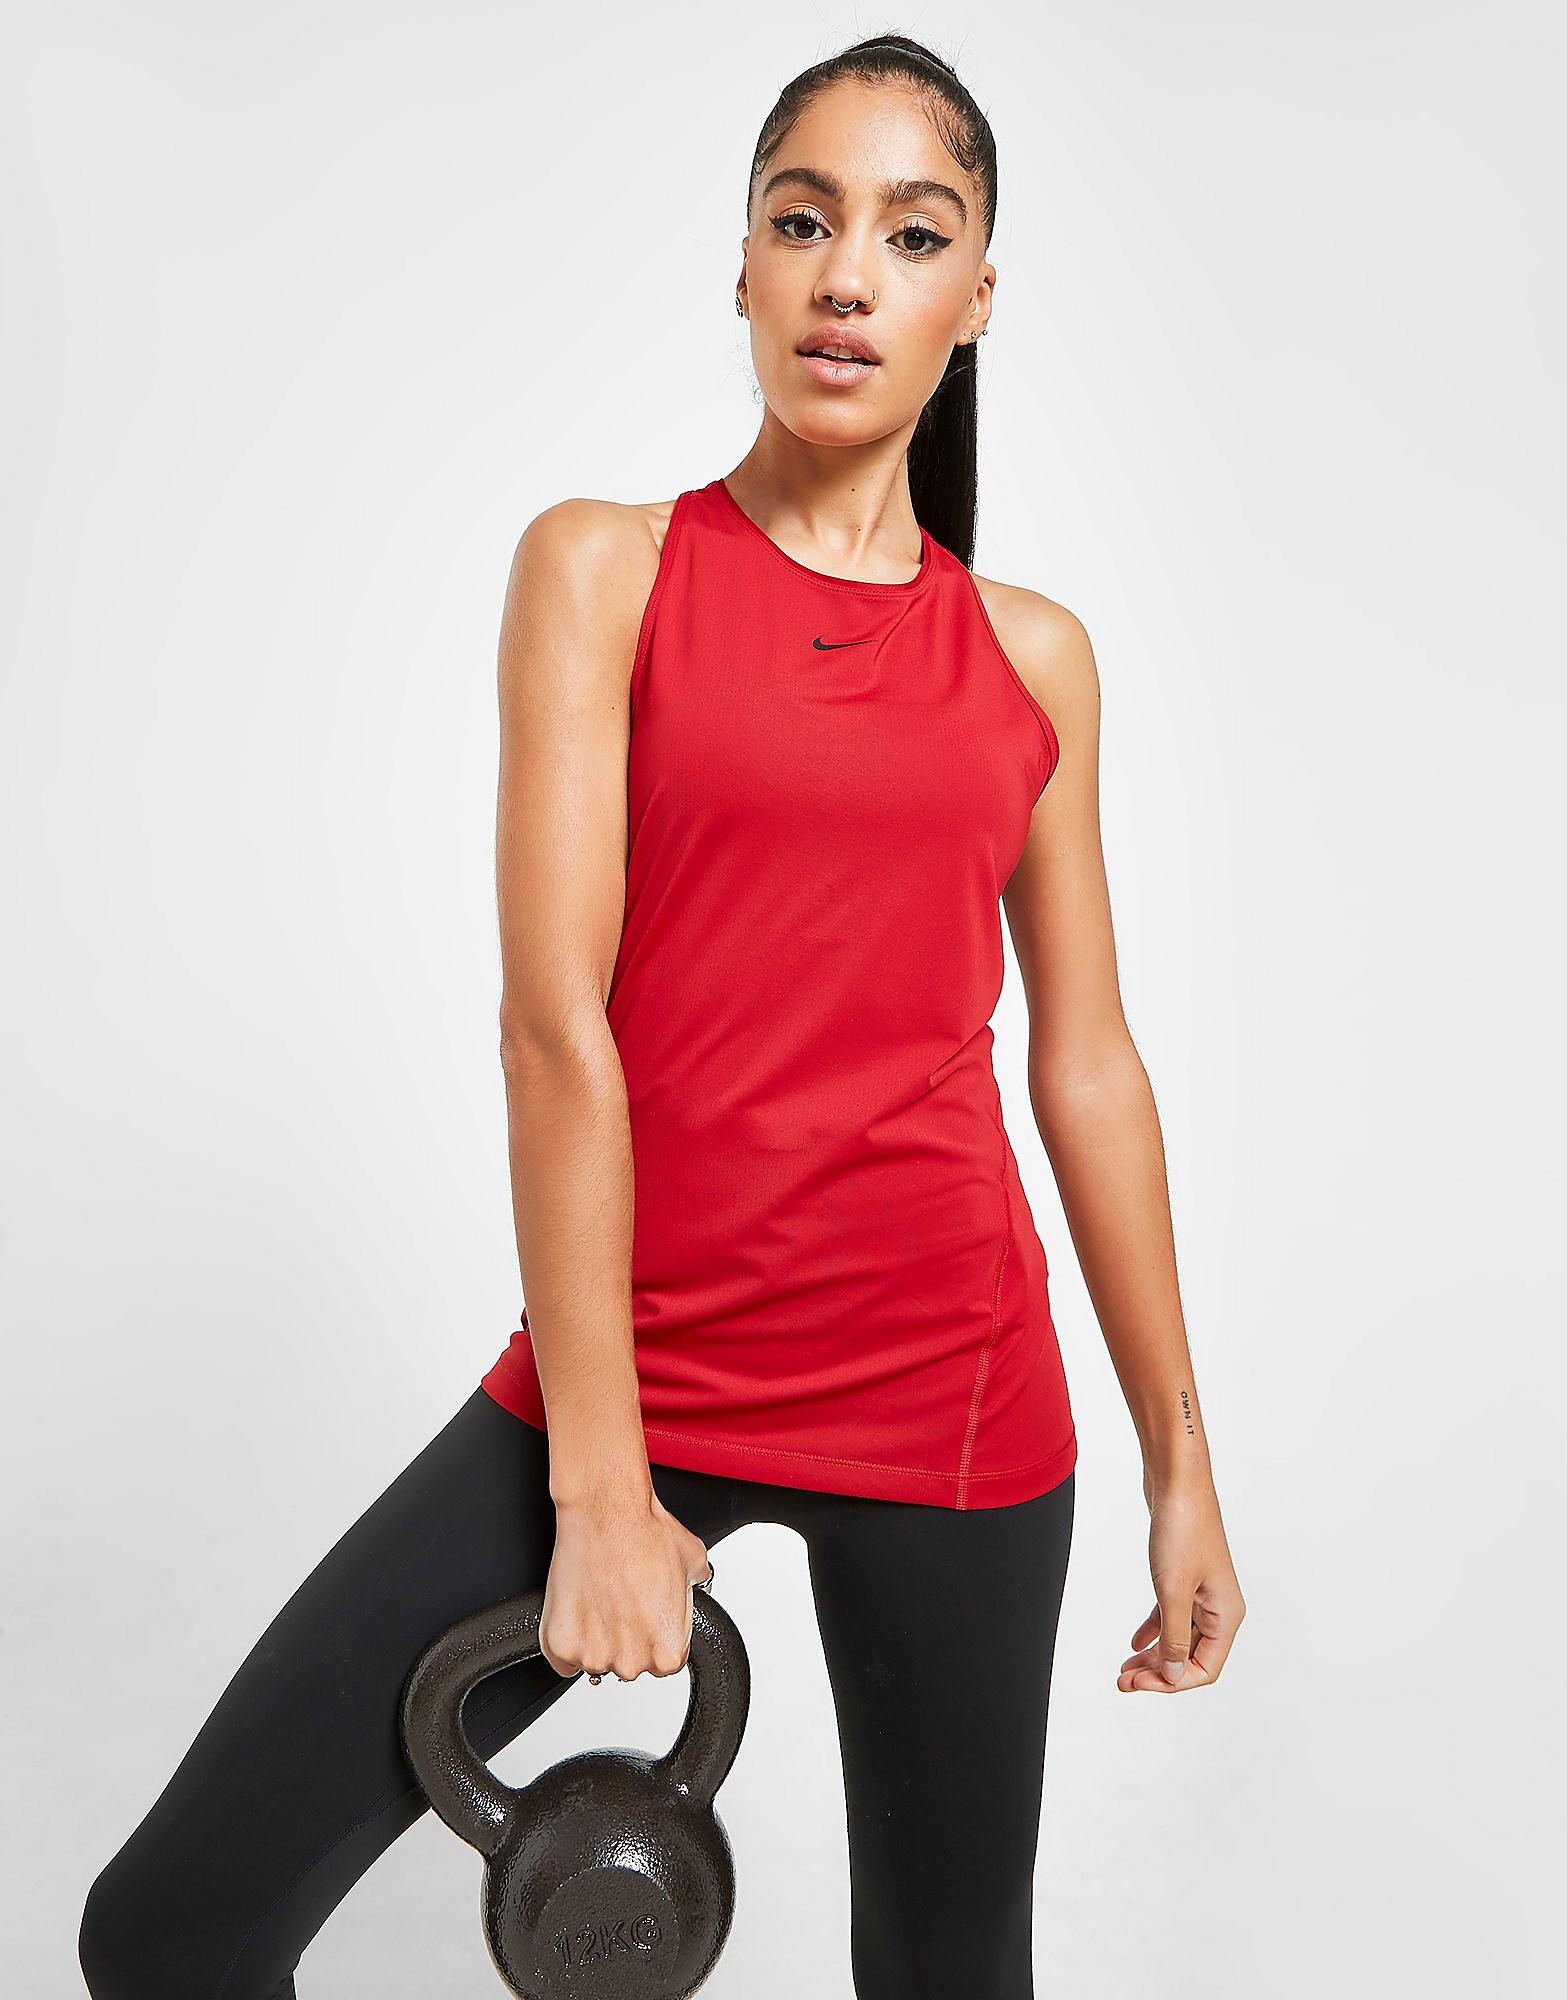 Nike Débardeur Pro Femme - Rose/Black, Rose/Black